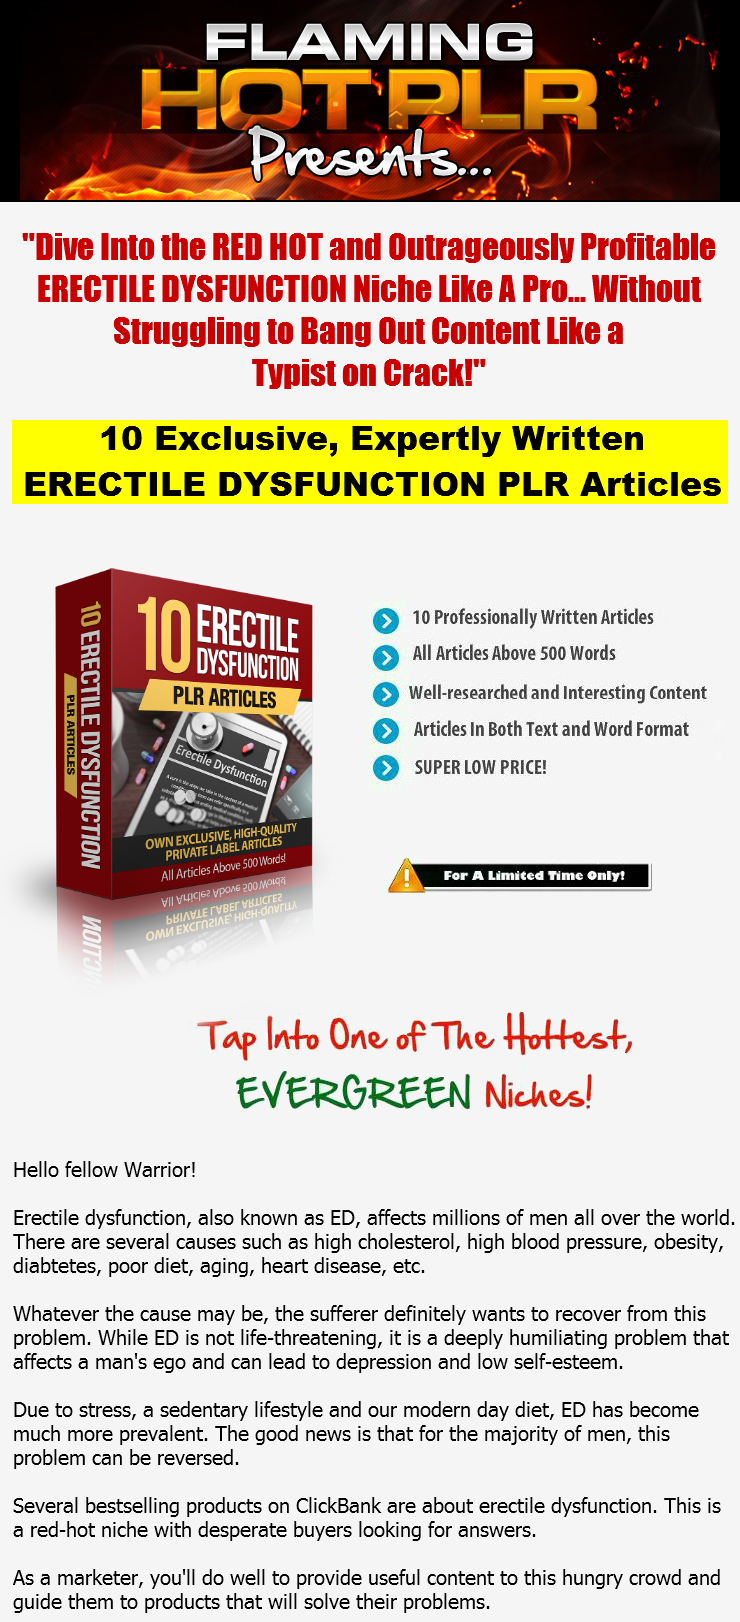 [GET] [ERECTILE DYSFUNCTION PLR] Exclusive, Expertly Written Erectile Dysfunction (ED) PLR Articles.